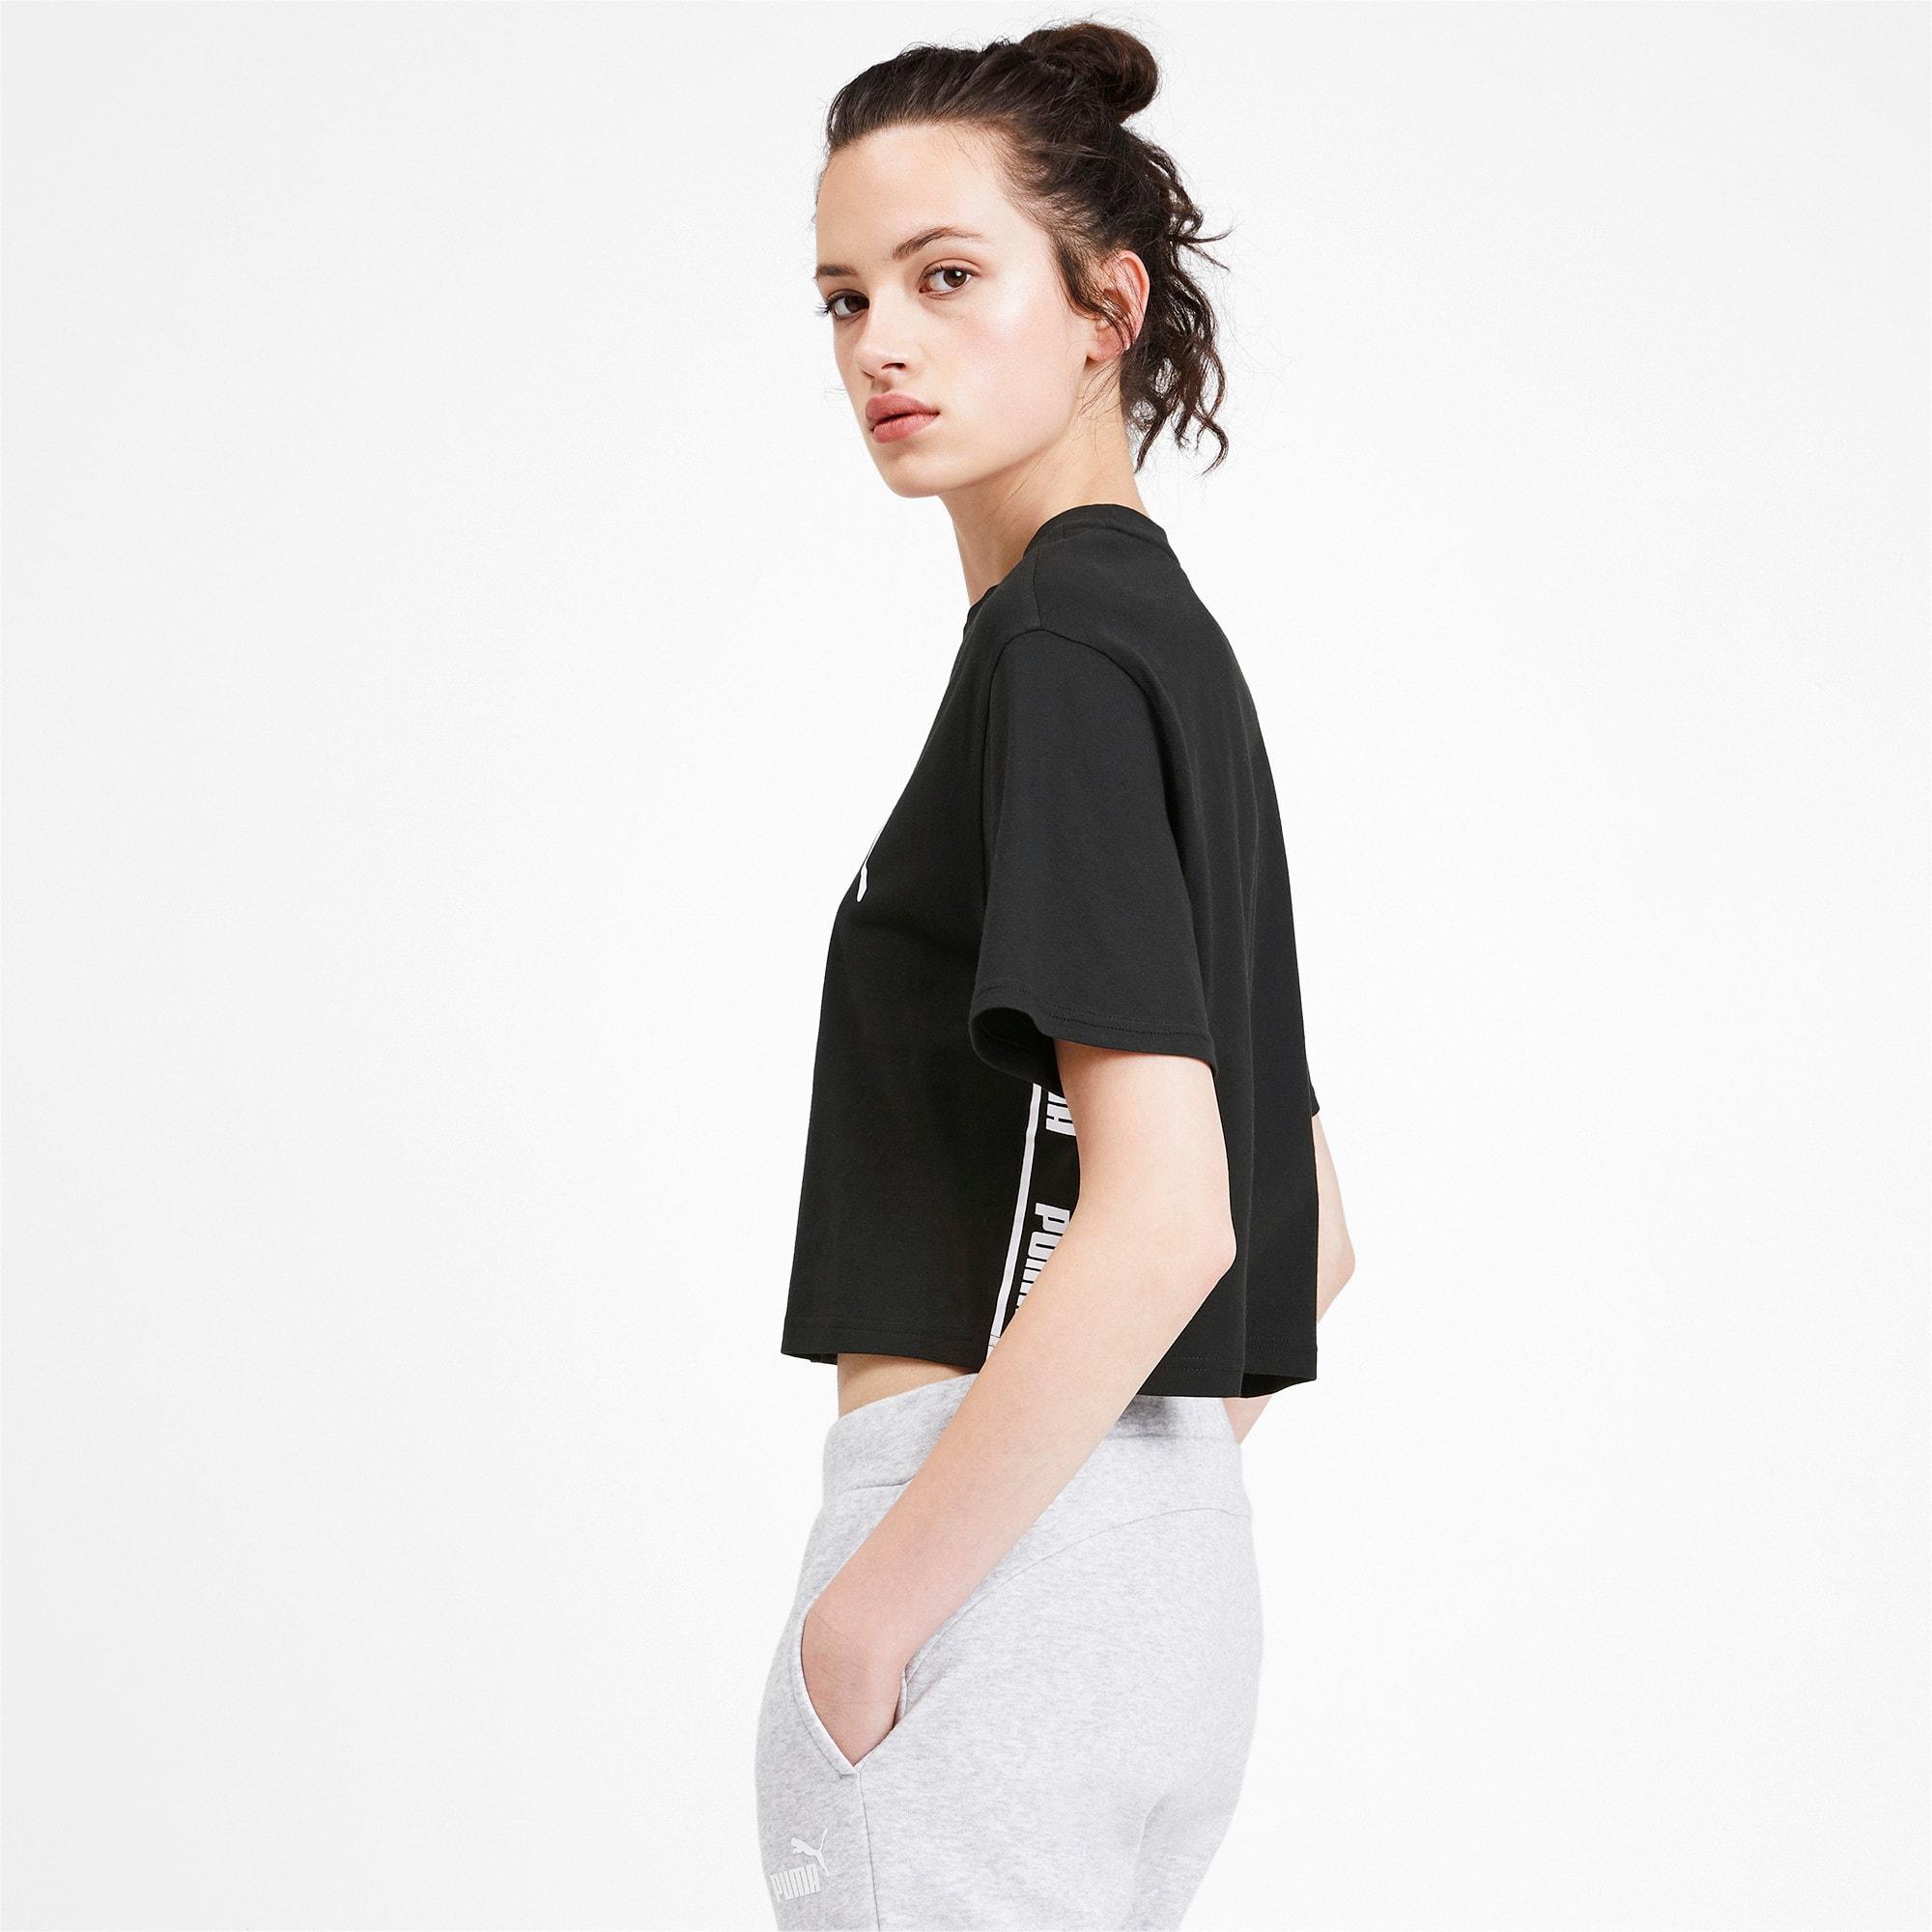 Miniatura 3 de Camiseta corta Amplified para mujer, Puma Black, mediano